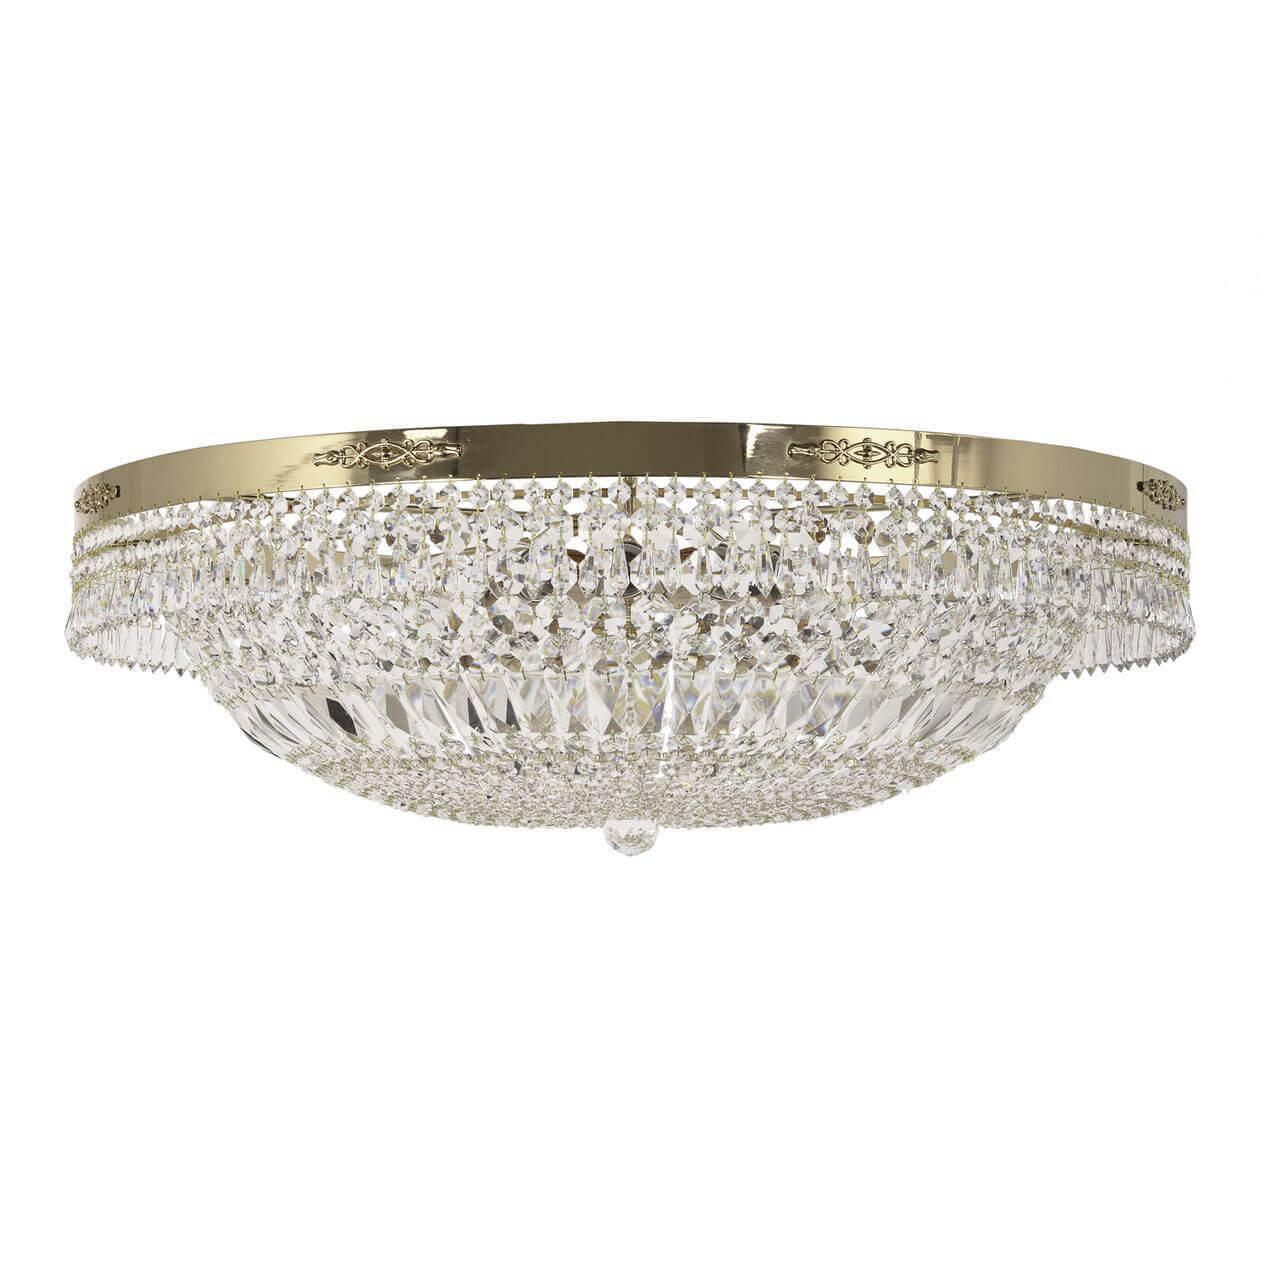 Светильник Dio D`arte Lodi E 1.2.80.200 G Lodi Gold светильник dio d arte lodi e 1 2 80 200 g lodi gold